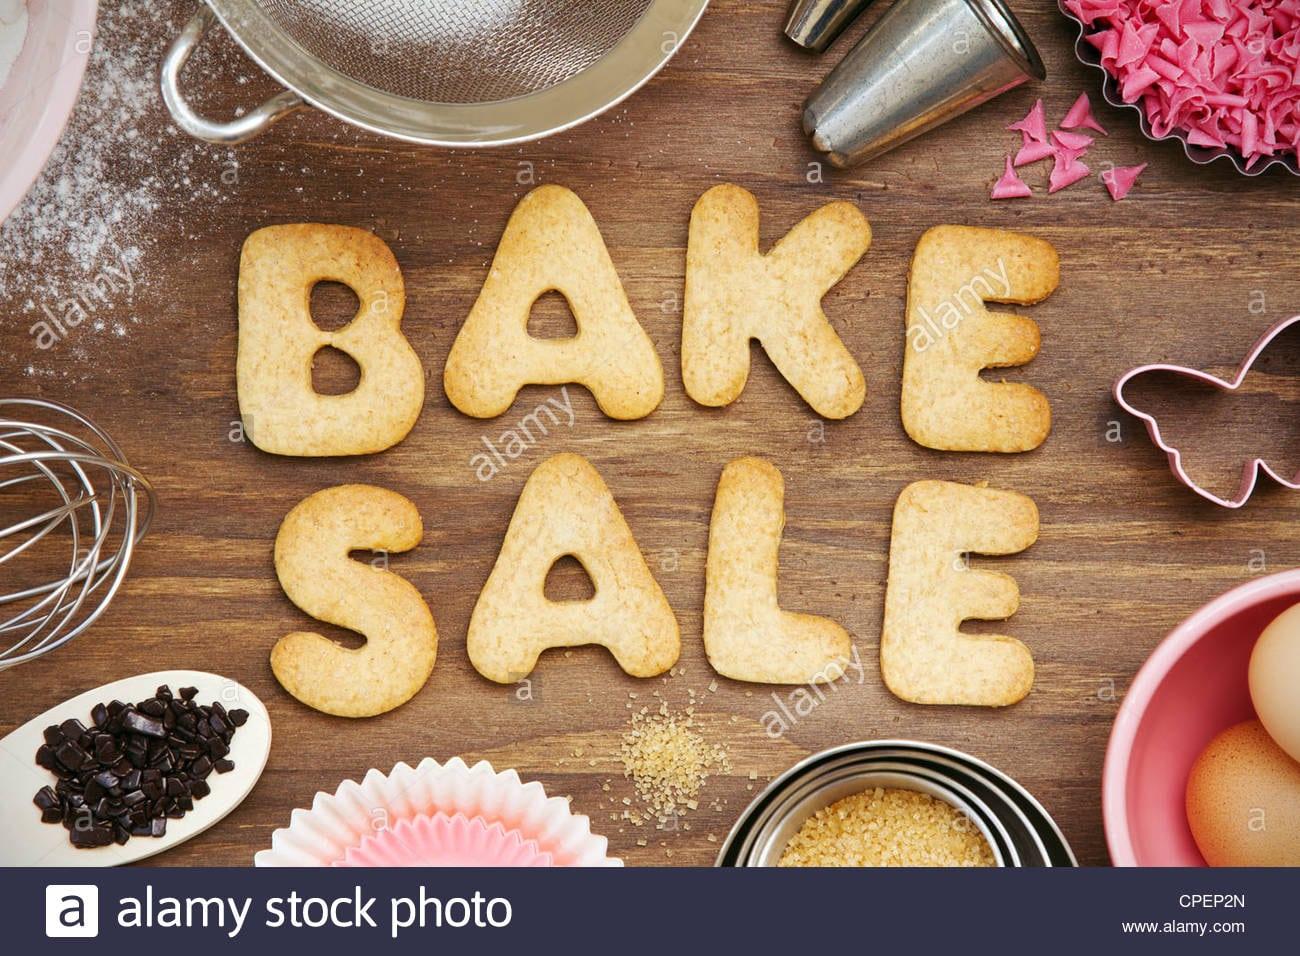 Bake Sale Cookies Stock Photos & Bake Sale Cookies Stock Images